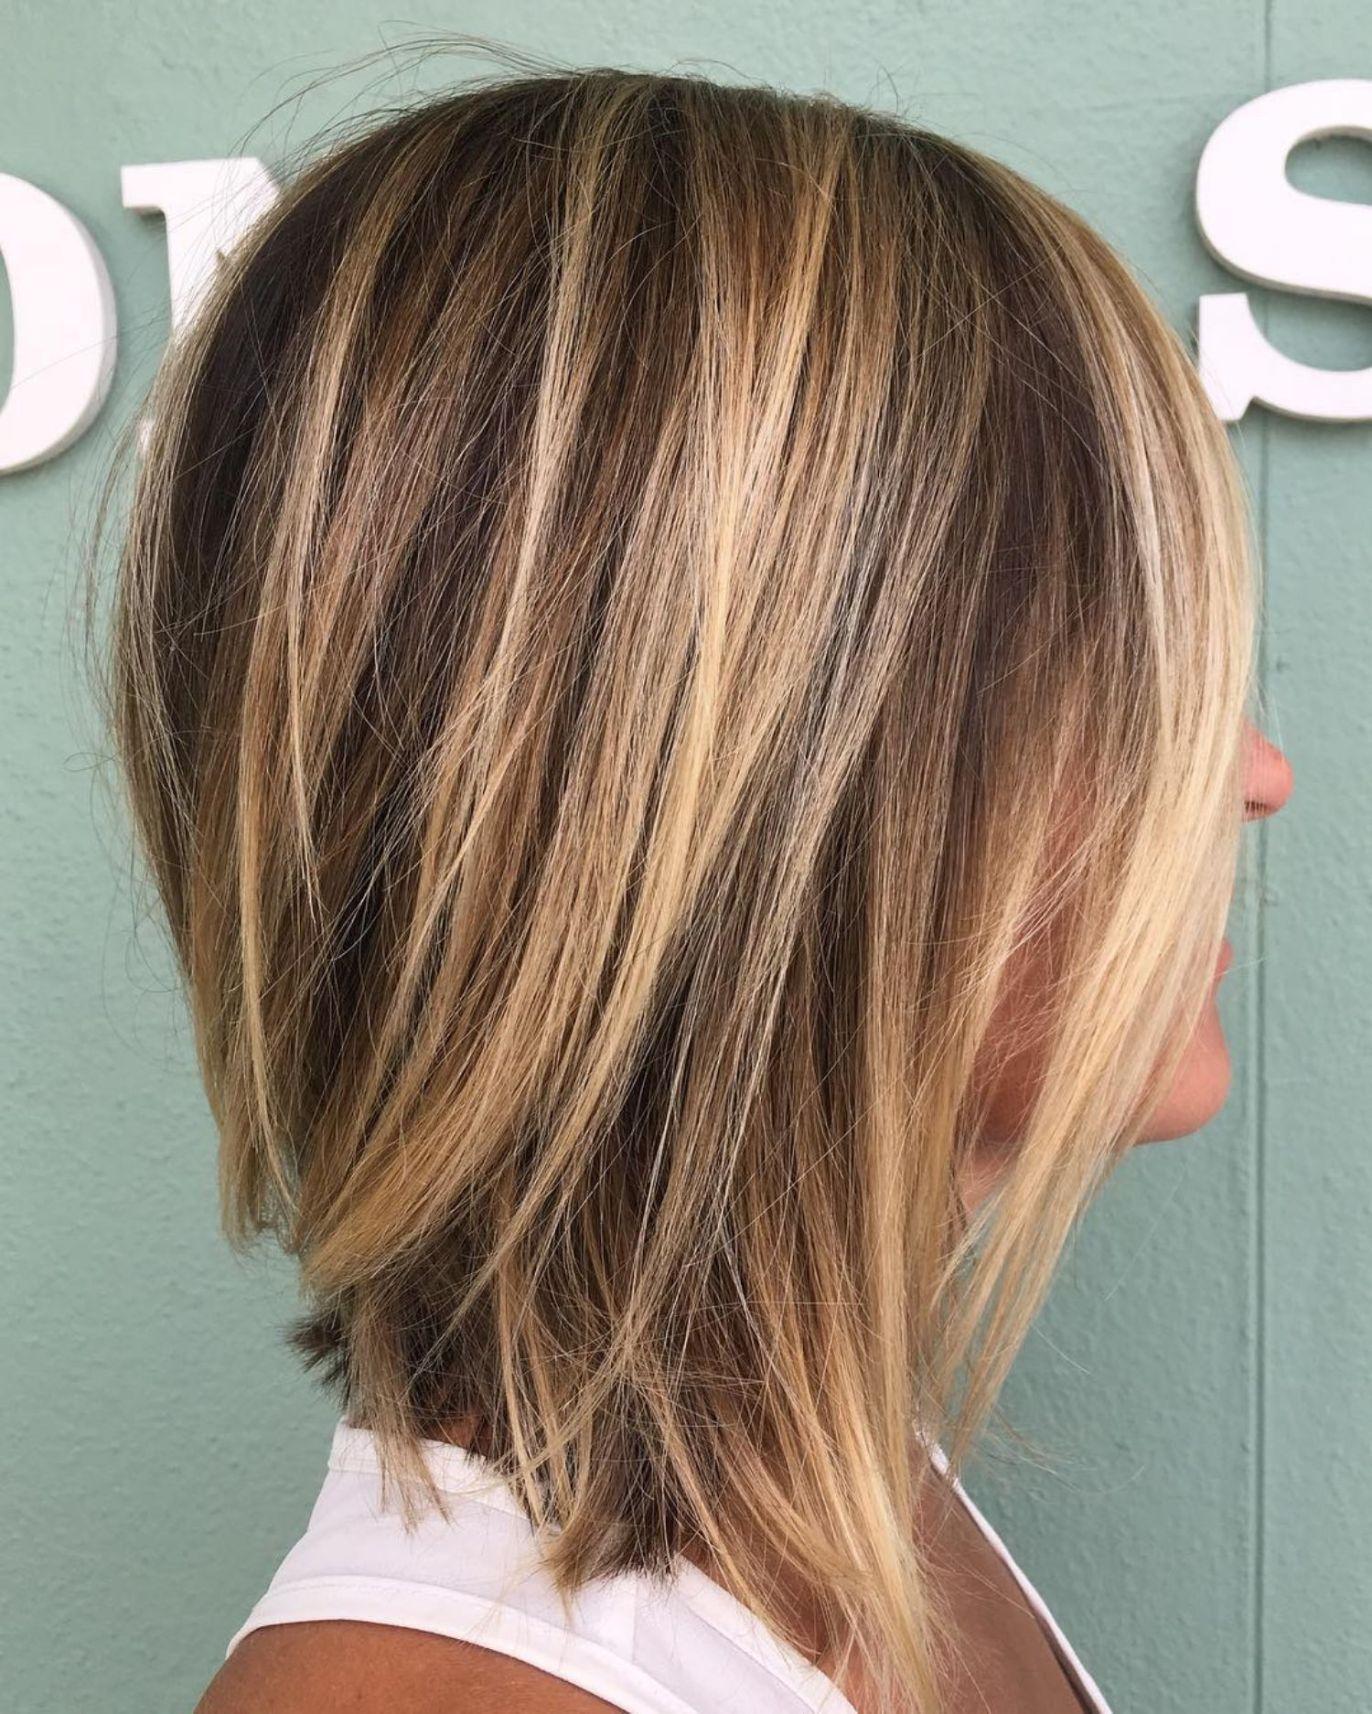 Pin on Hairstyles | 2020 | Svetlana | 2021